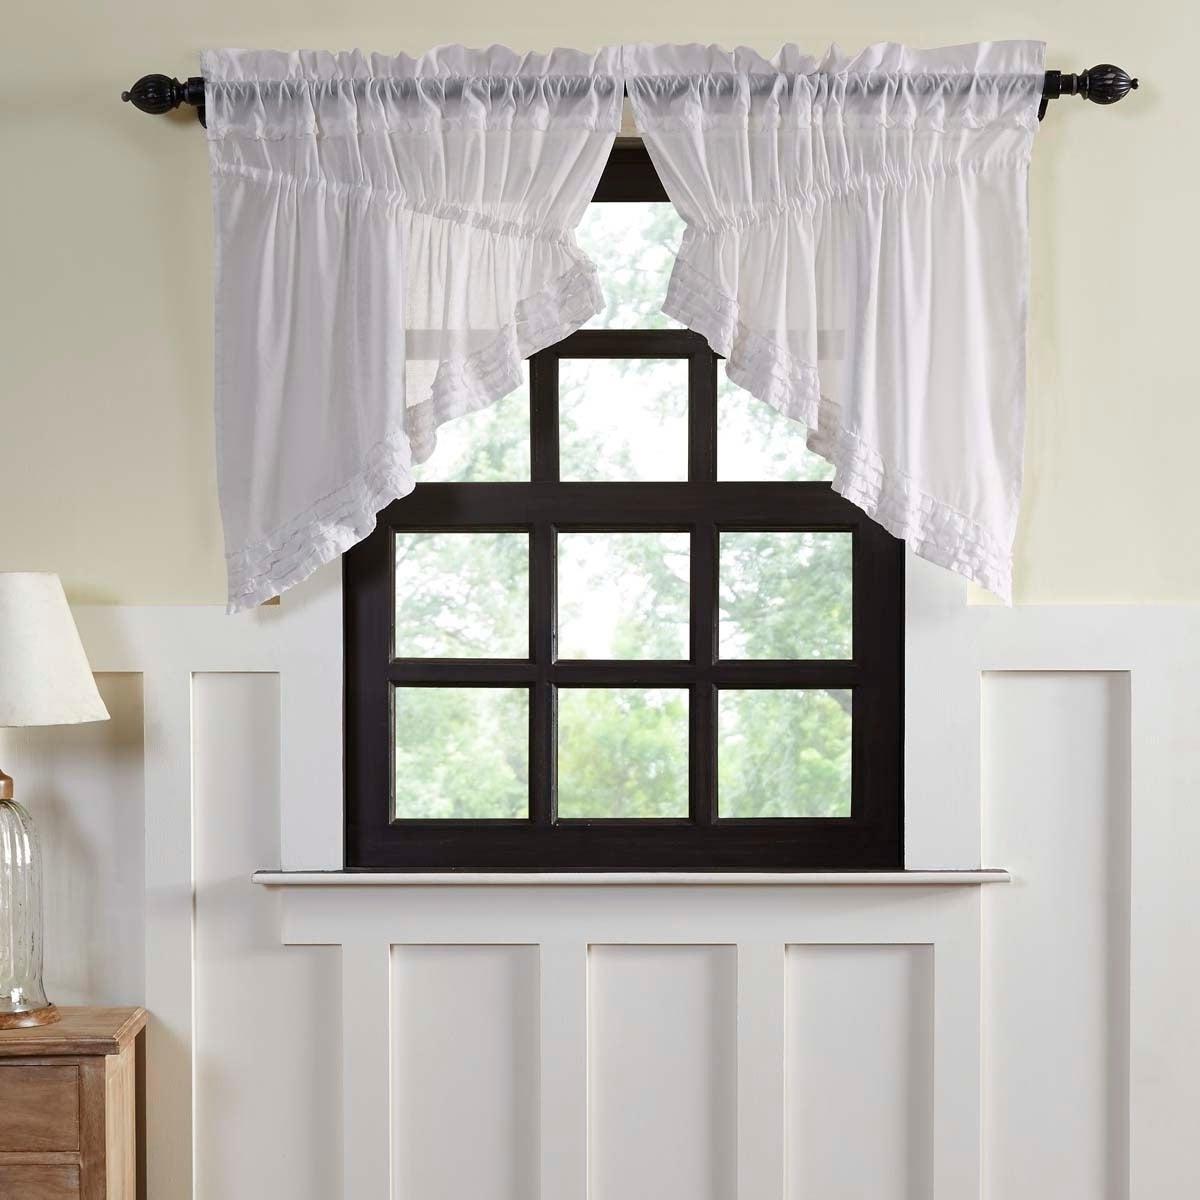 Bermuda Ruffle Kitchen Curtain Tier Sets Regarding Latest Details About White Farmhouse Kitchen Curtains Vhc White Ruffled Sheer Soft  White 36X (View 4 of 20)